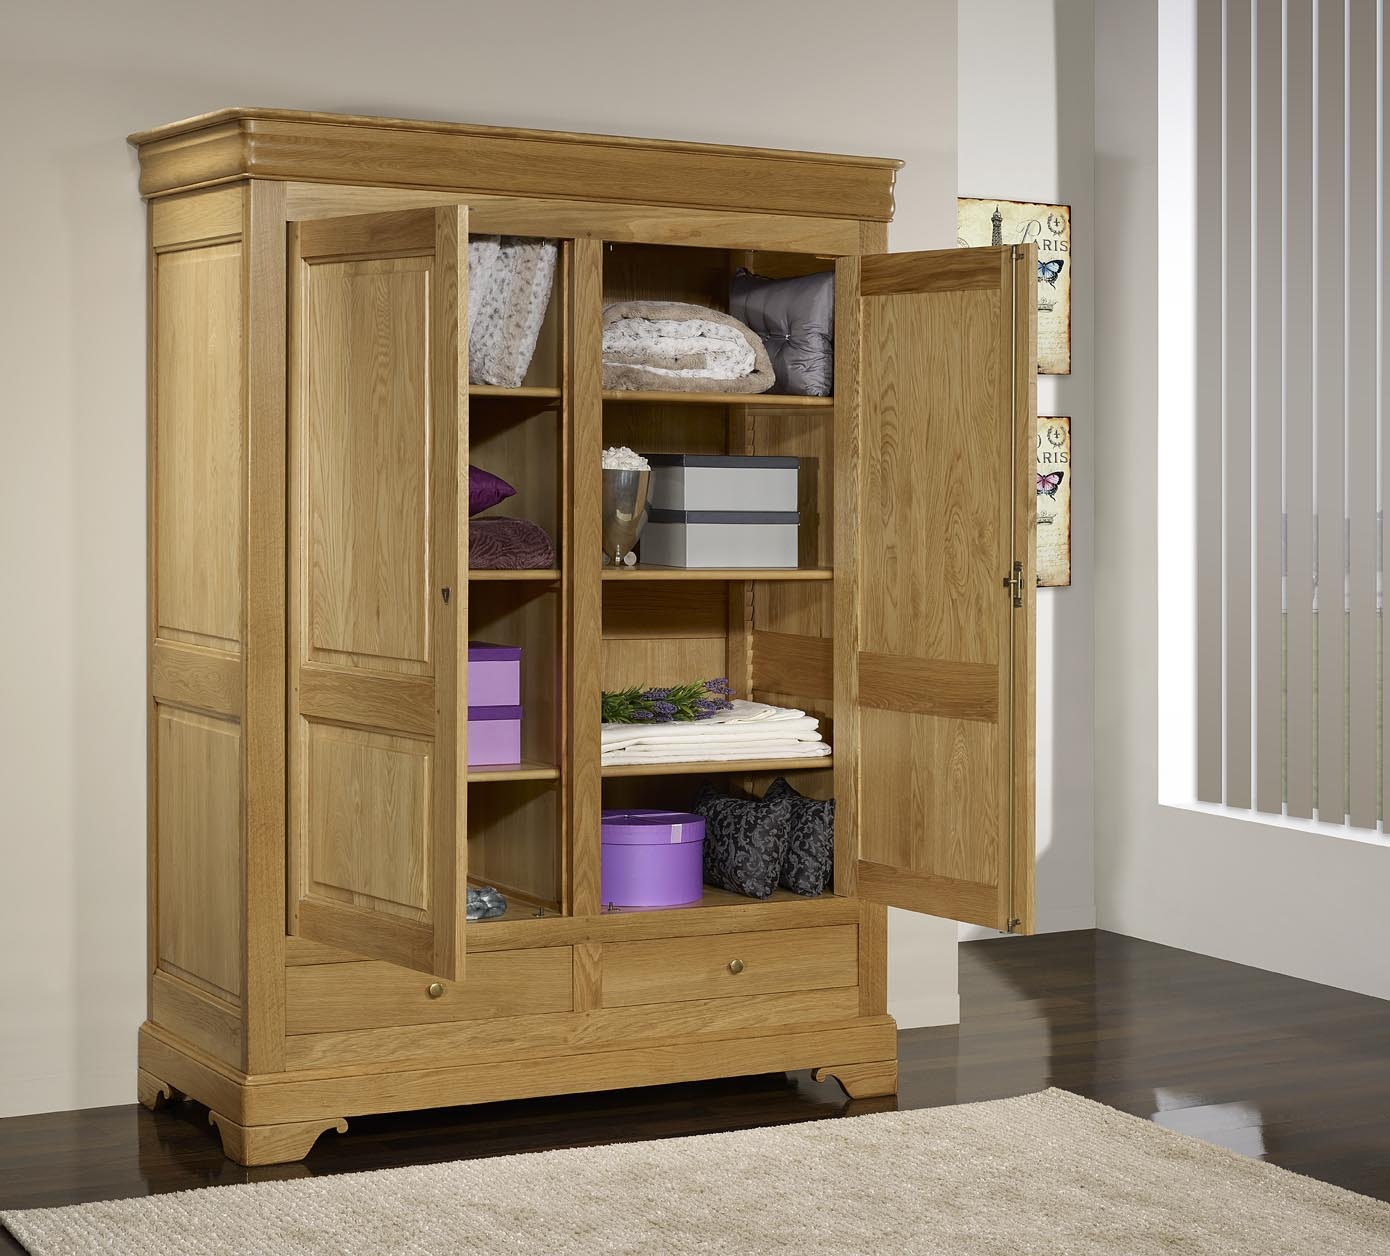 armoire 2 portes 2 tiroirs hugo en ch ne massif de style. Black Bedroom Furniture Sets. Home Design Ideas